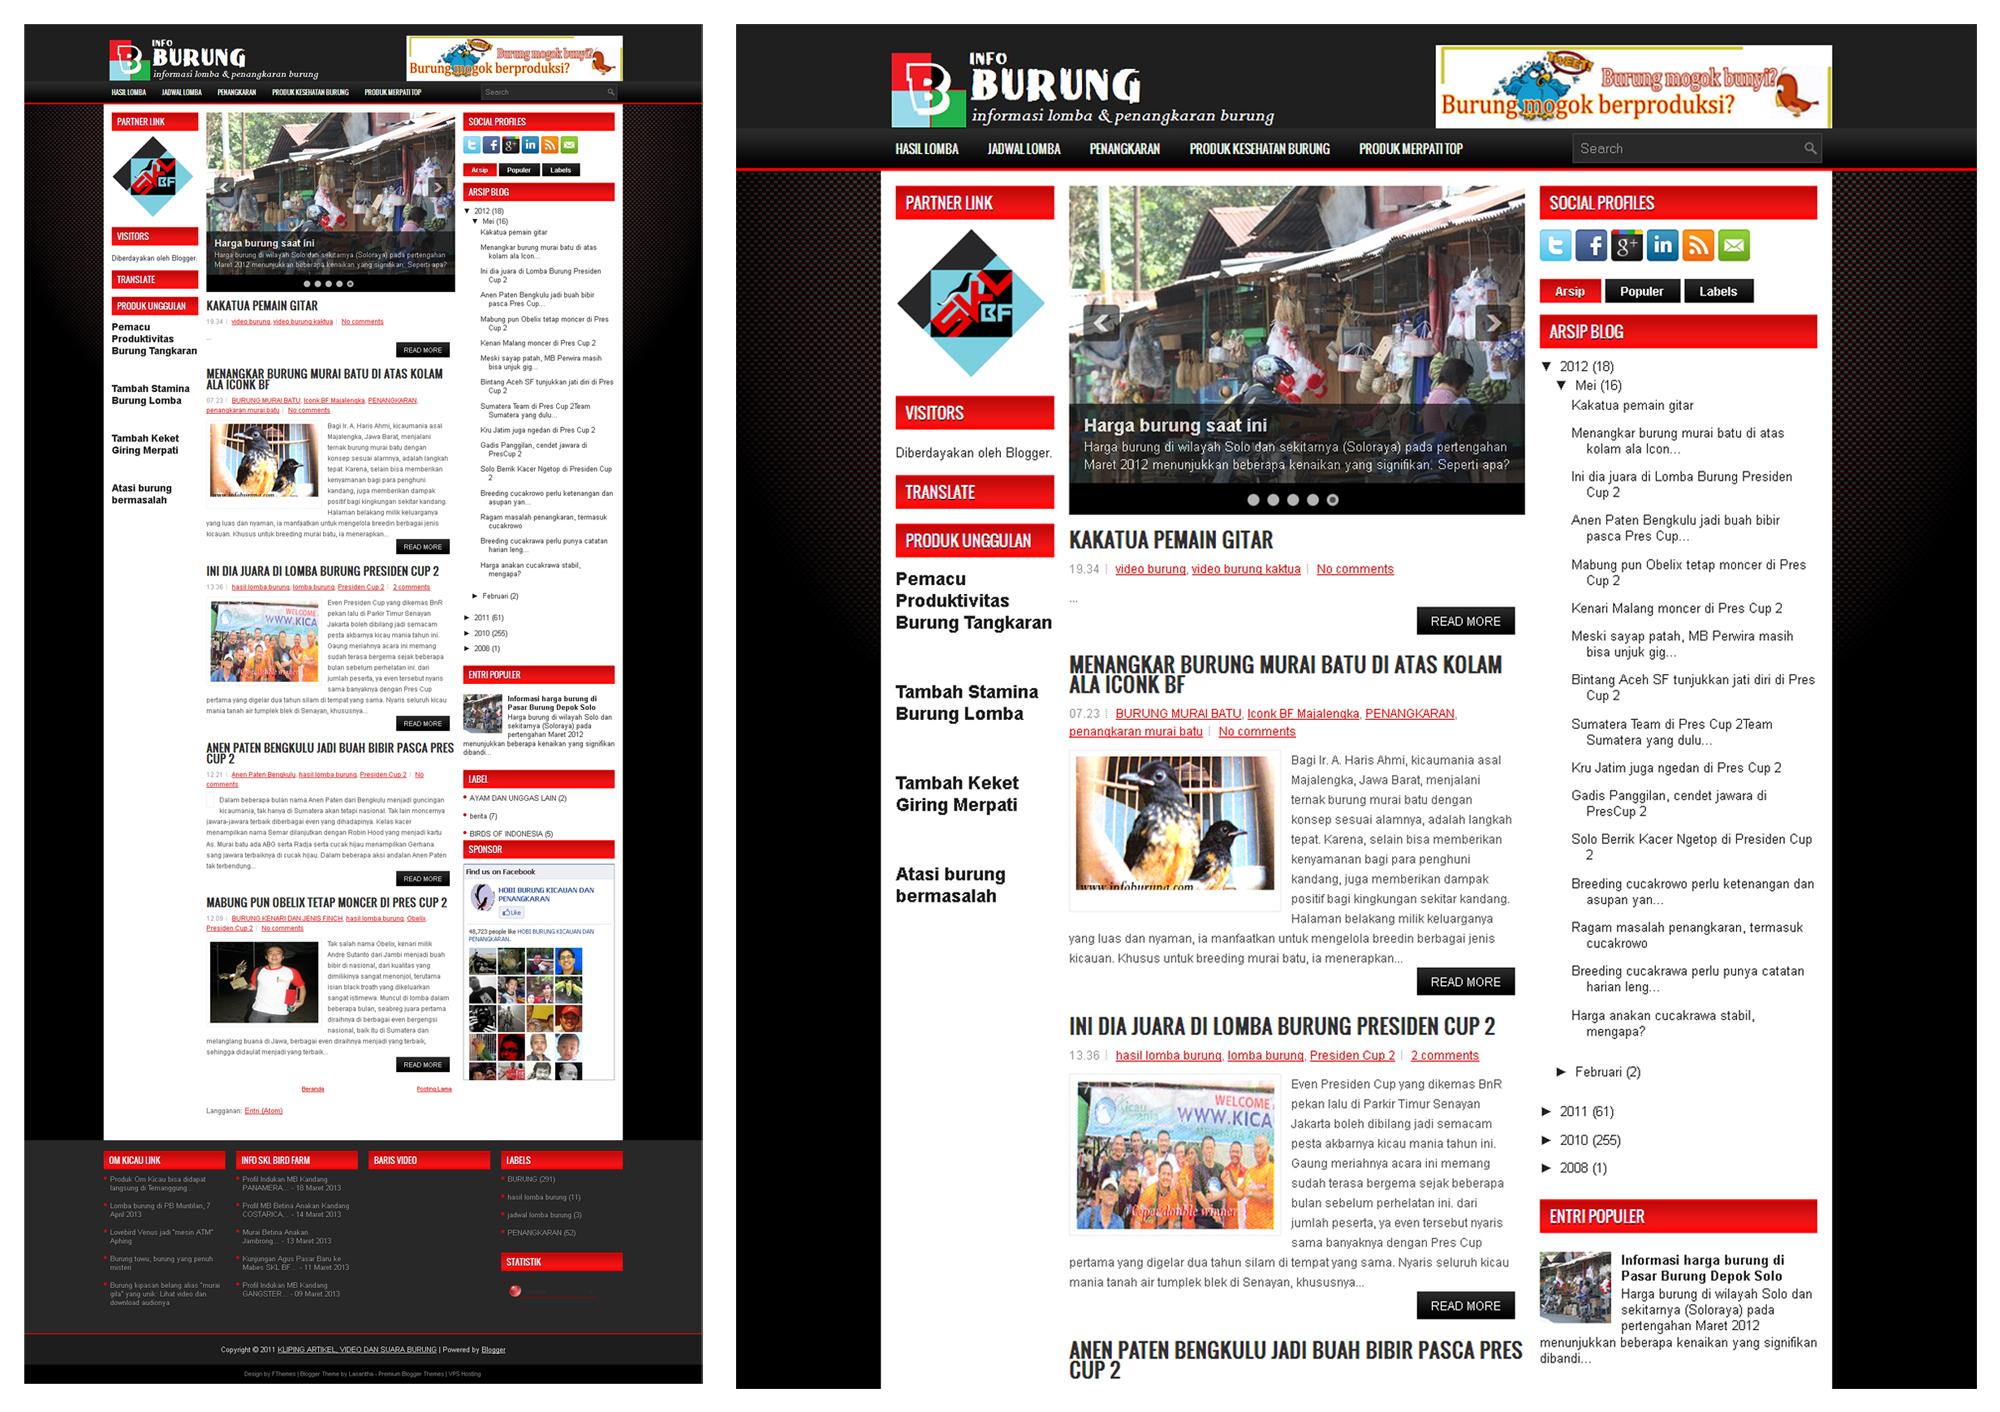 Website Info Burung (infoburung.com)